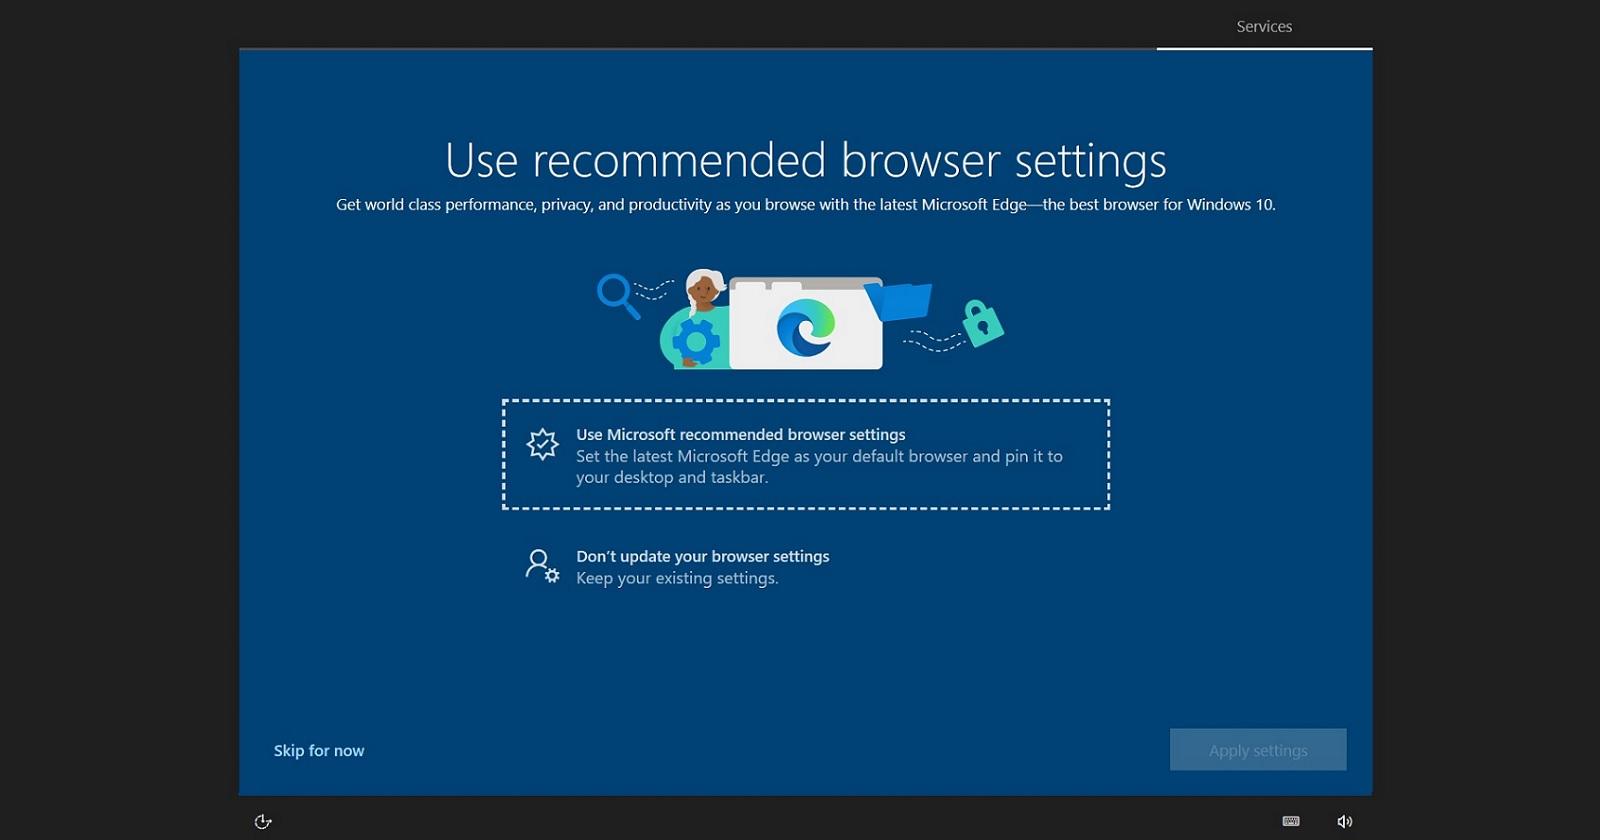 Windows 10 выводит полноэкранный баннер рекламы Microsoft Edge